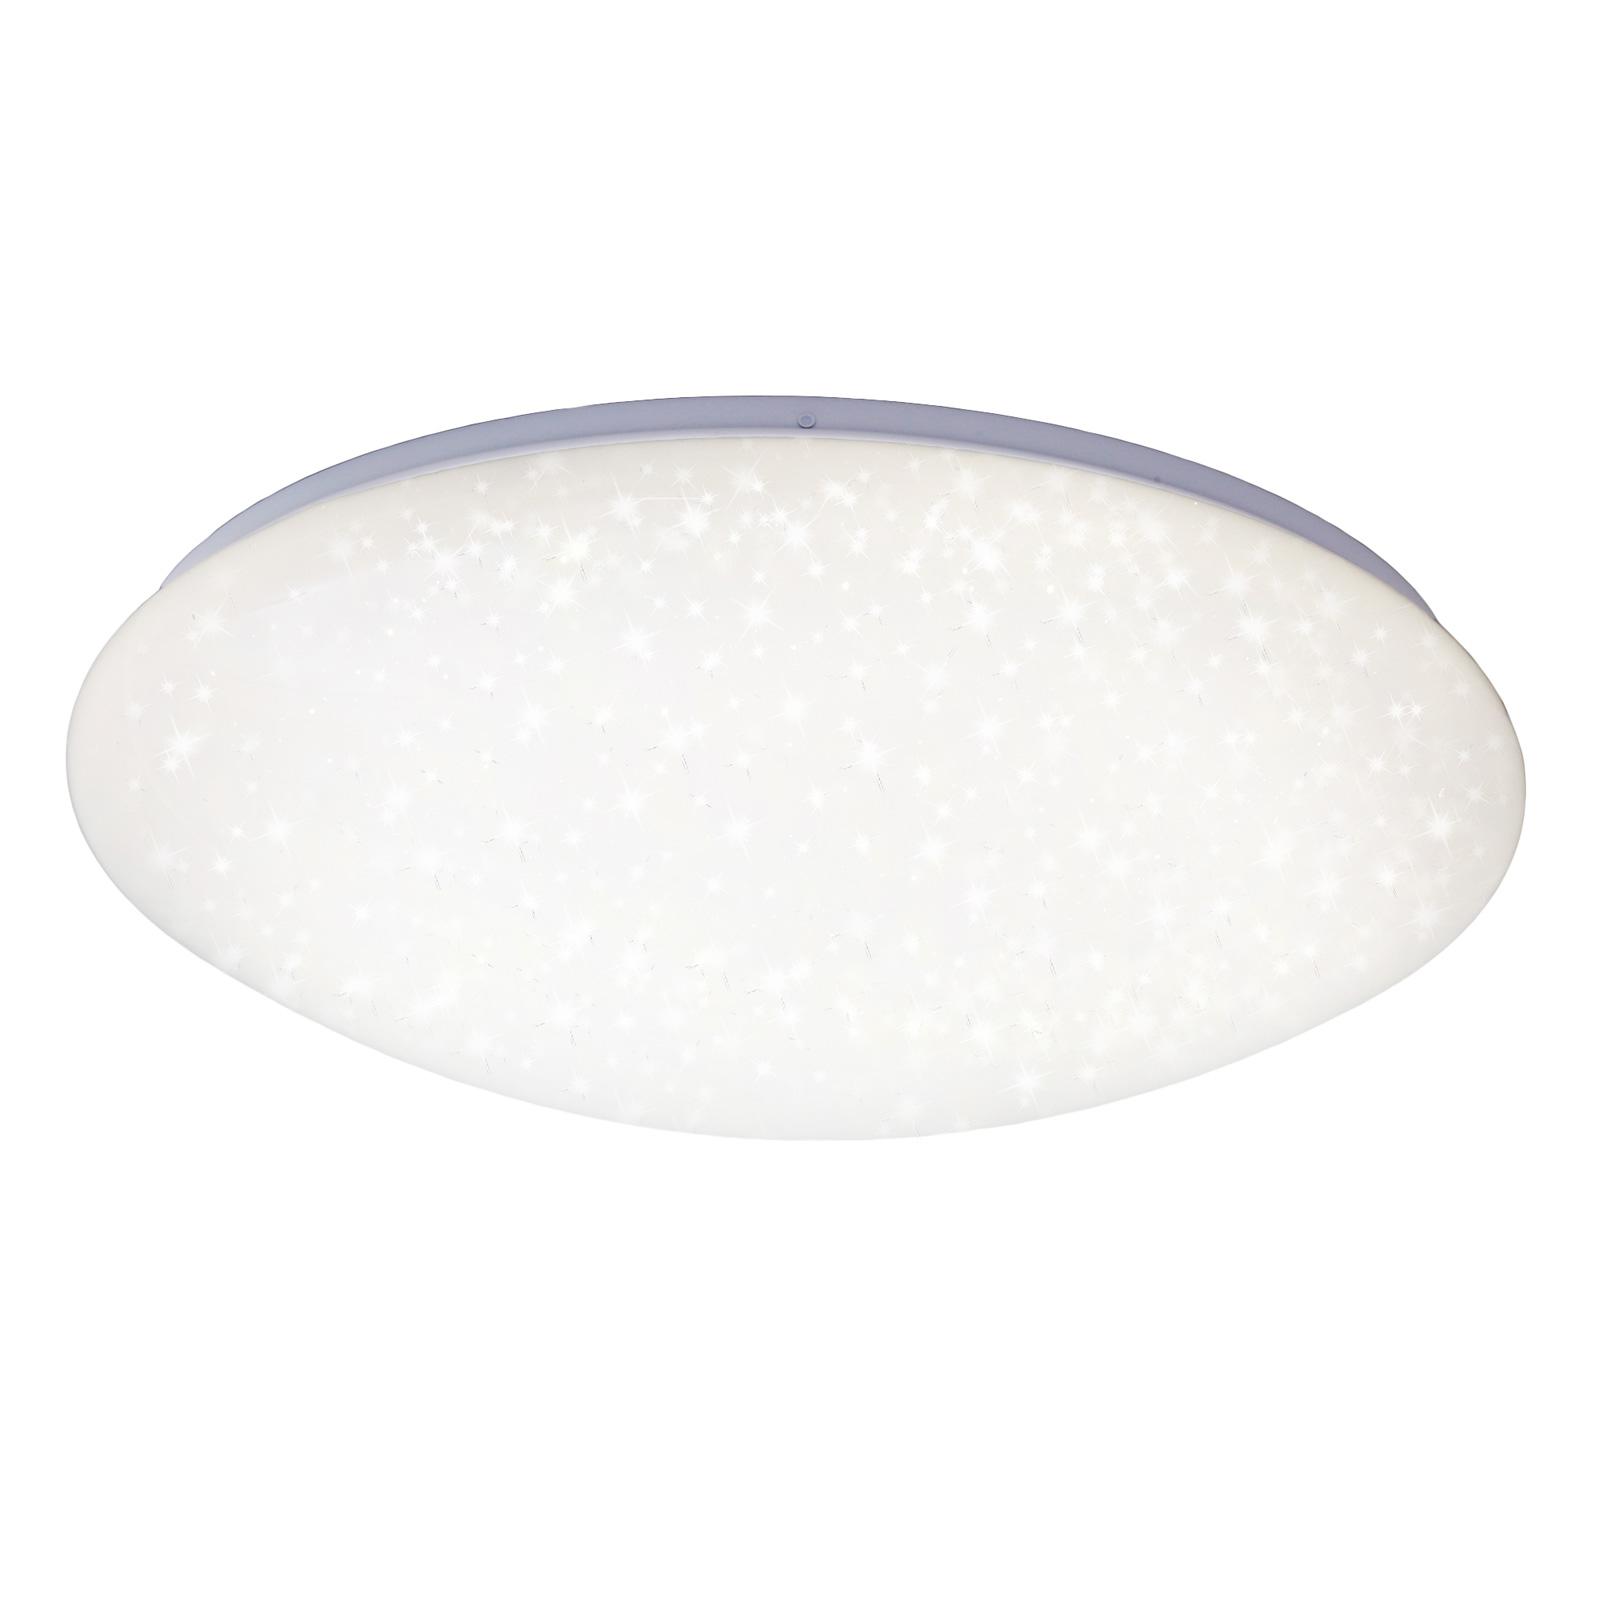 LED-Deckenlampe 3226-016 Sternenhimmel-Effekt 49cm